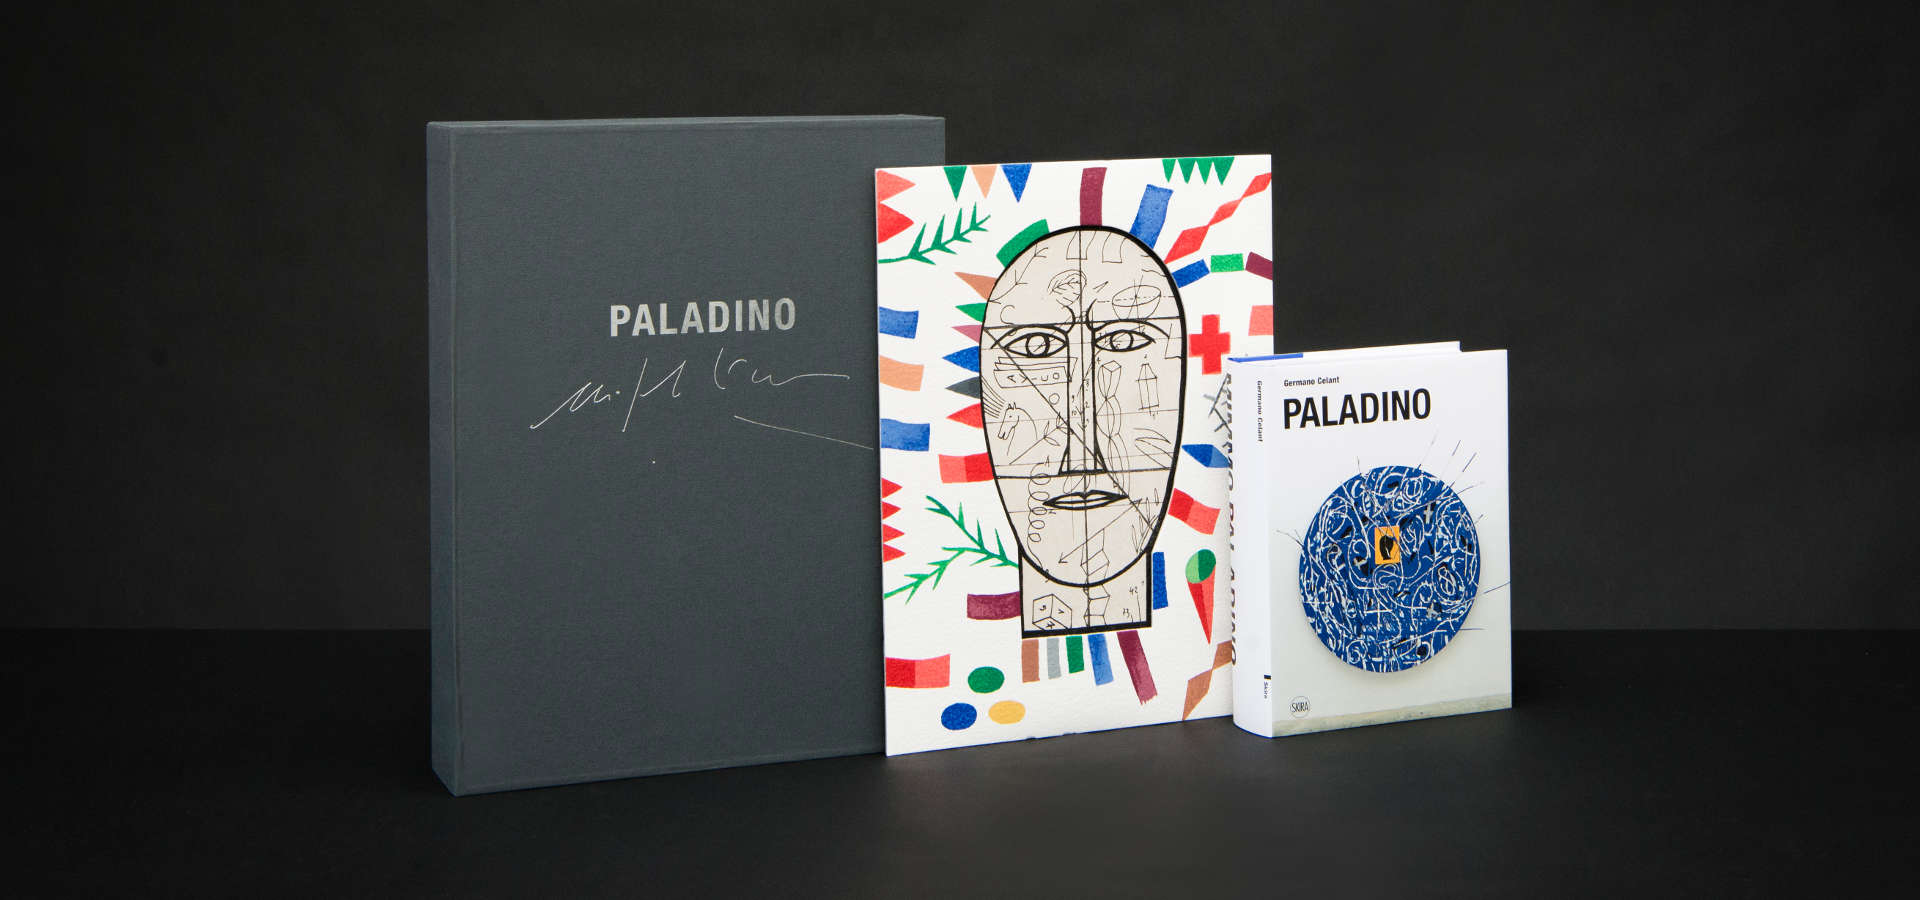 Mimmo Paladino